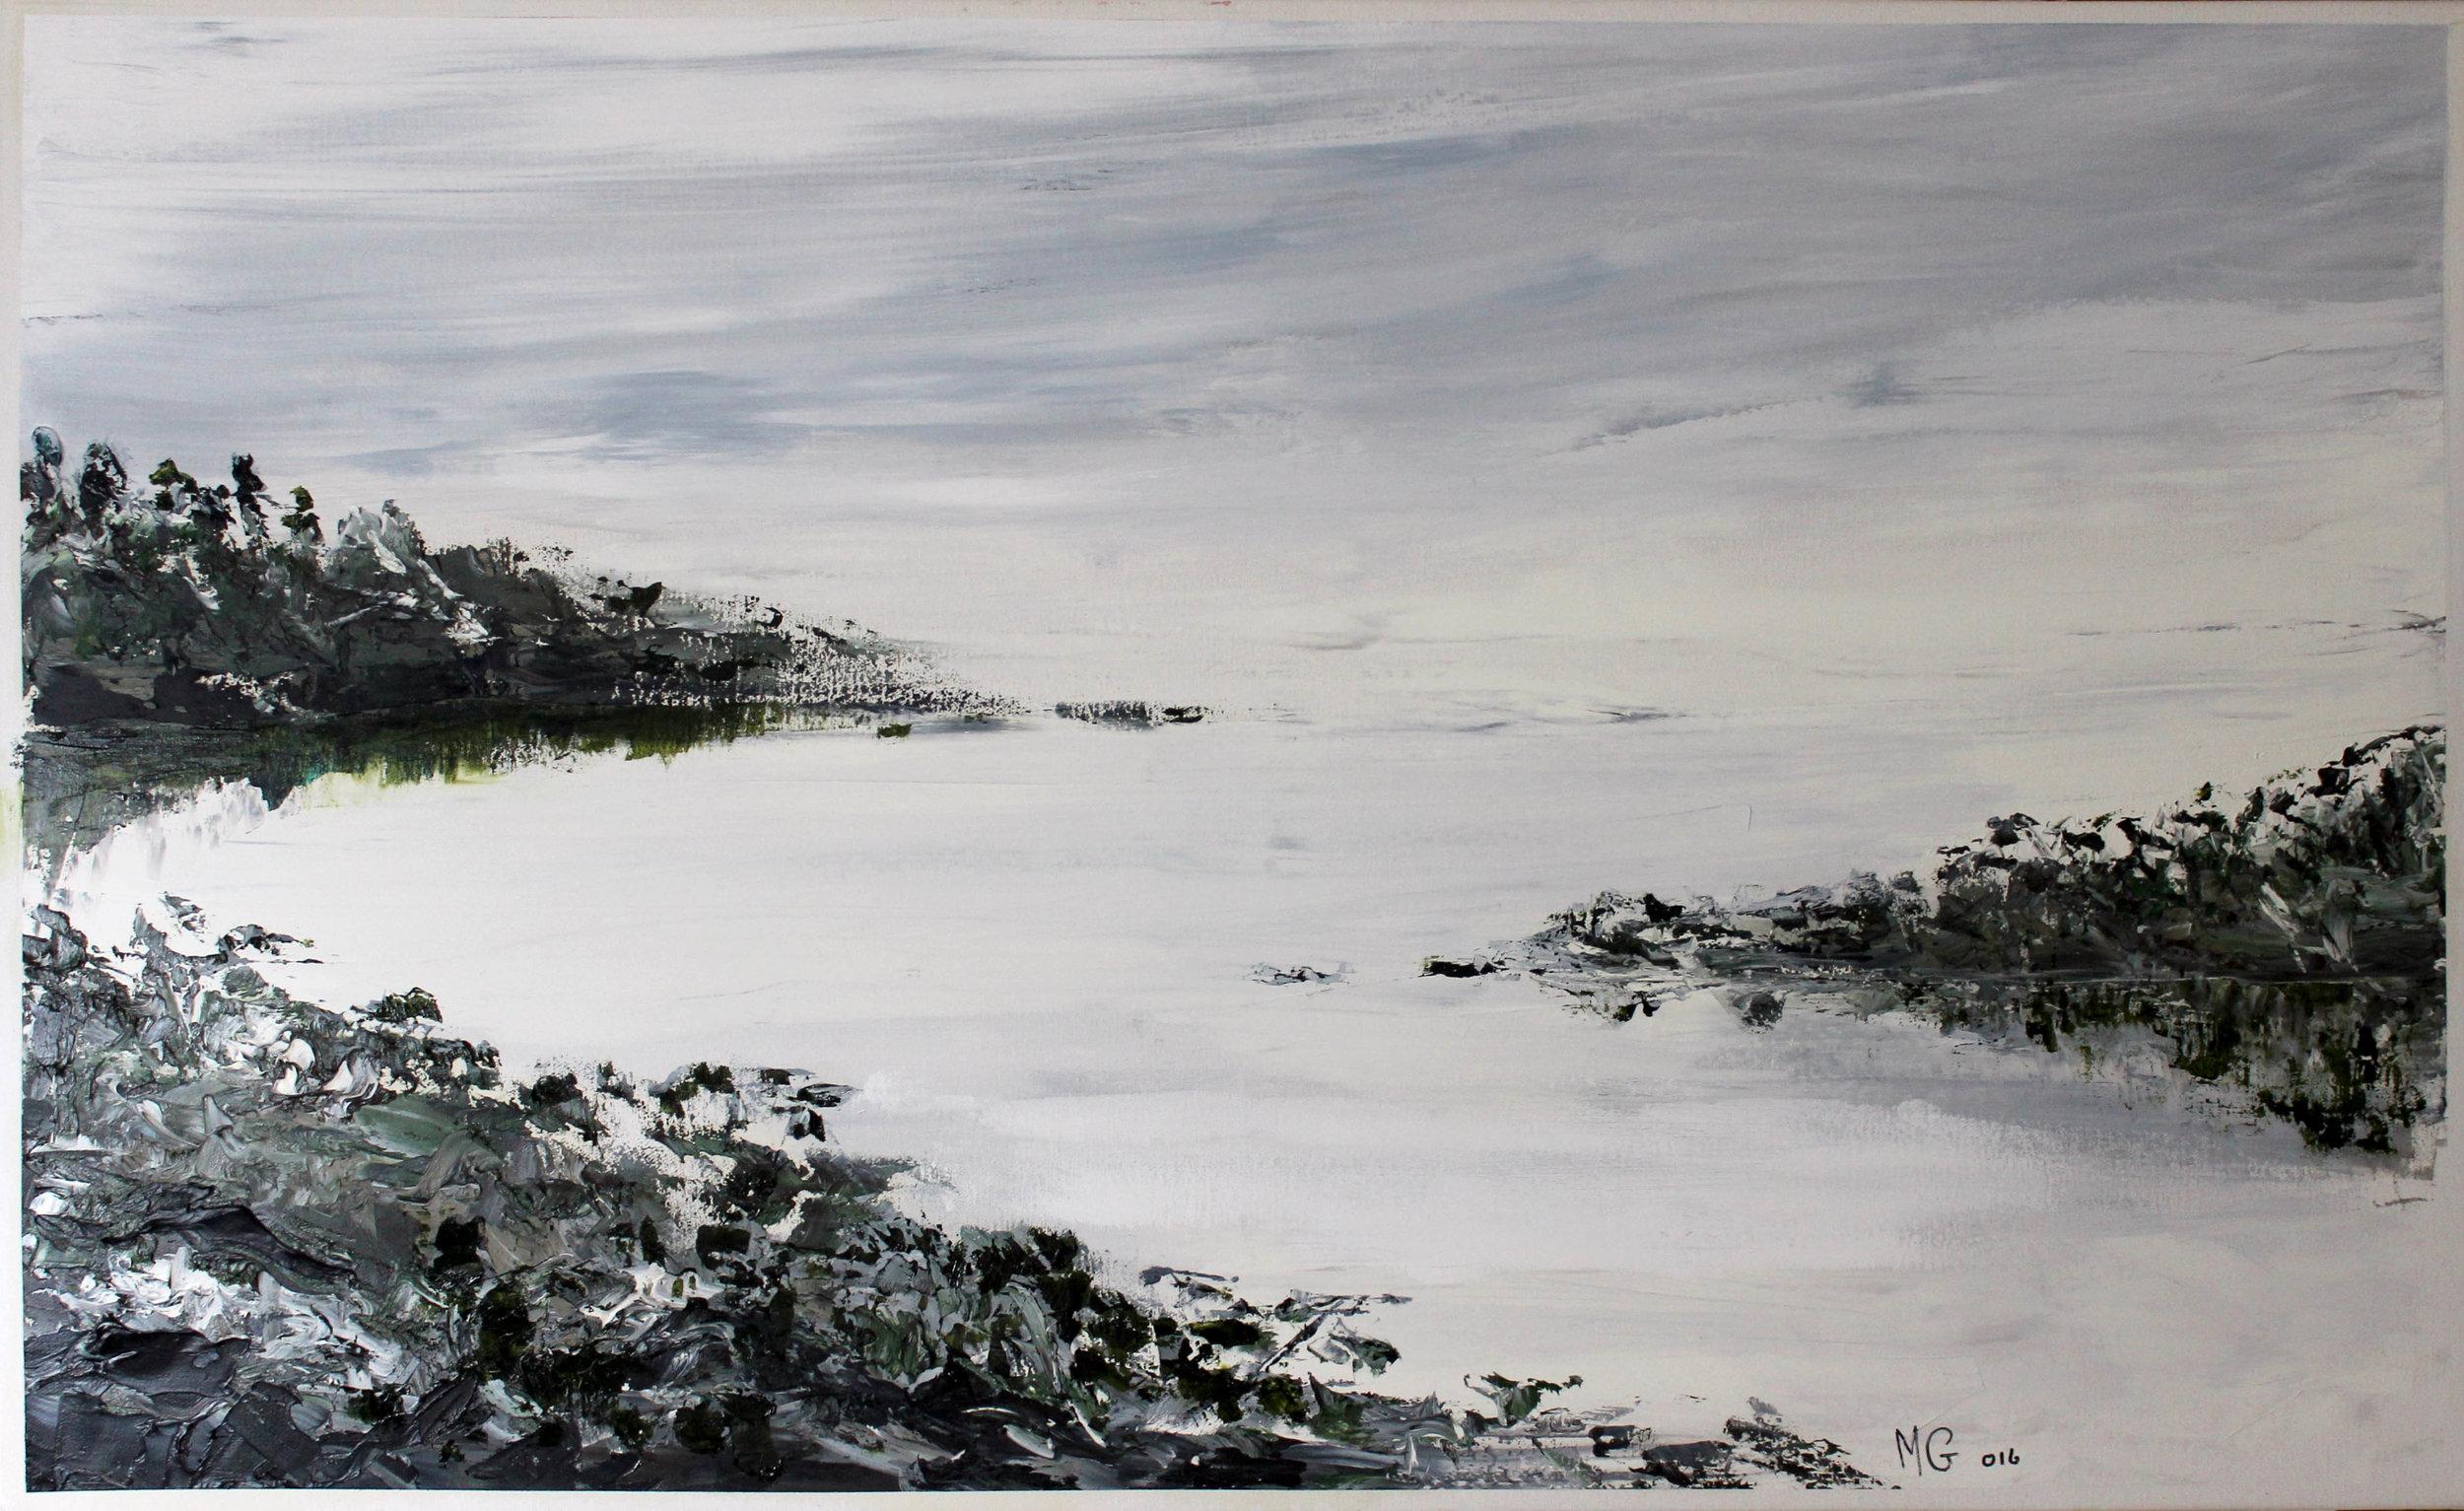 5. GALLAGHER_Martin_Heading Towards Open Water (Nambucca Heads)_122cmx76cm_Oil on Canvas.jpg